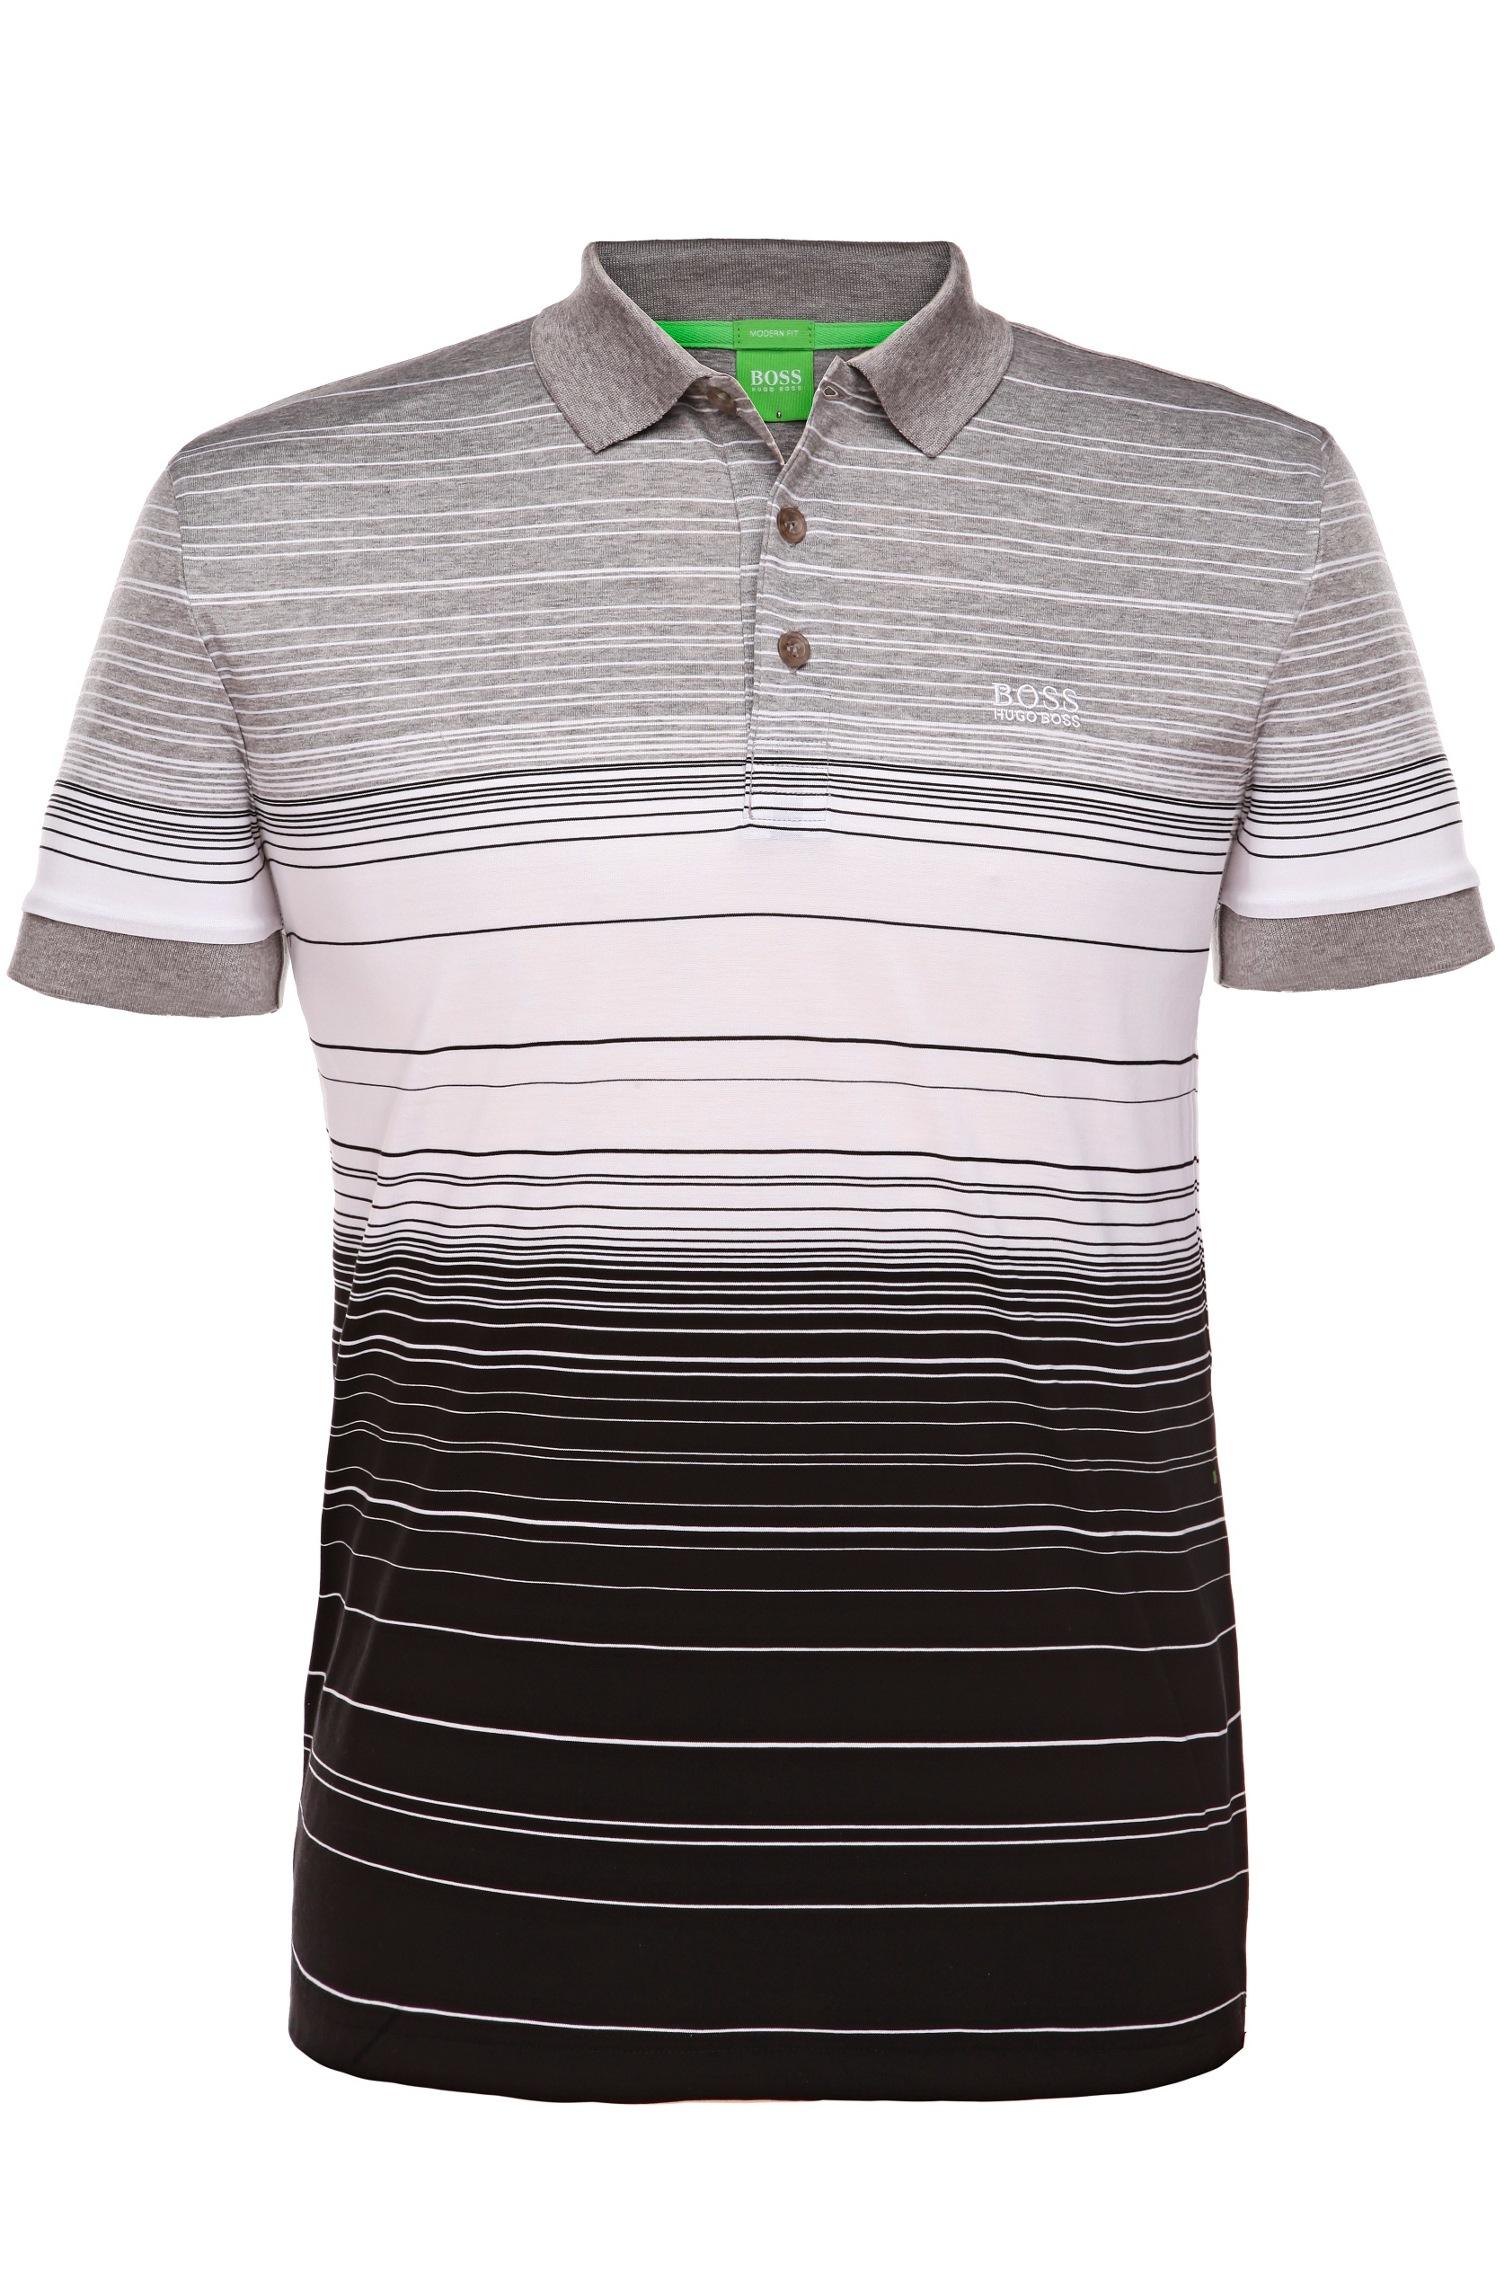 dd46b485a BOSS Green 'paddy 3' | Modern Fit, Mercerized Cotton Polo in Gray ...